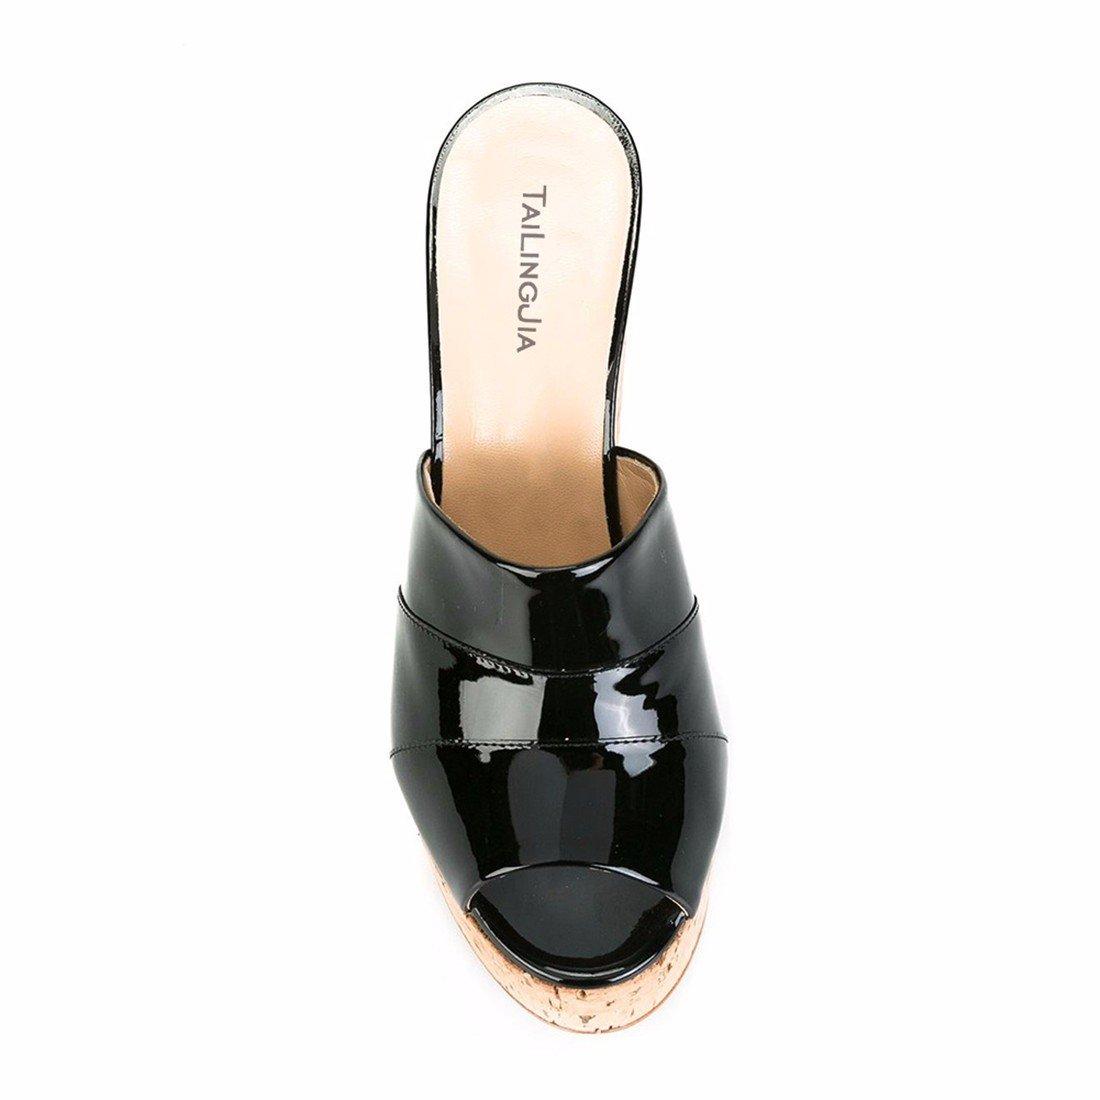 Damen Sandalen Hang mit Sandelholz-Grain Sandalen Große Zahl der Drag Kühlen Drag der und Drop schwarz 7f0d51